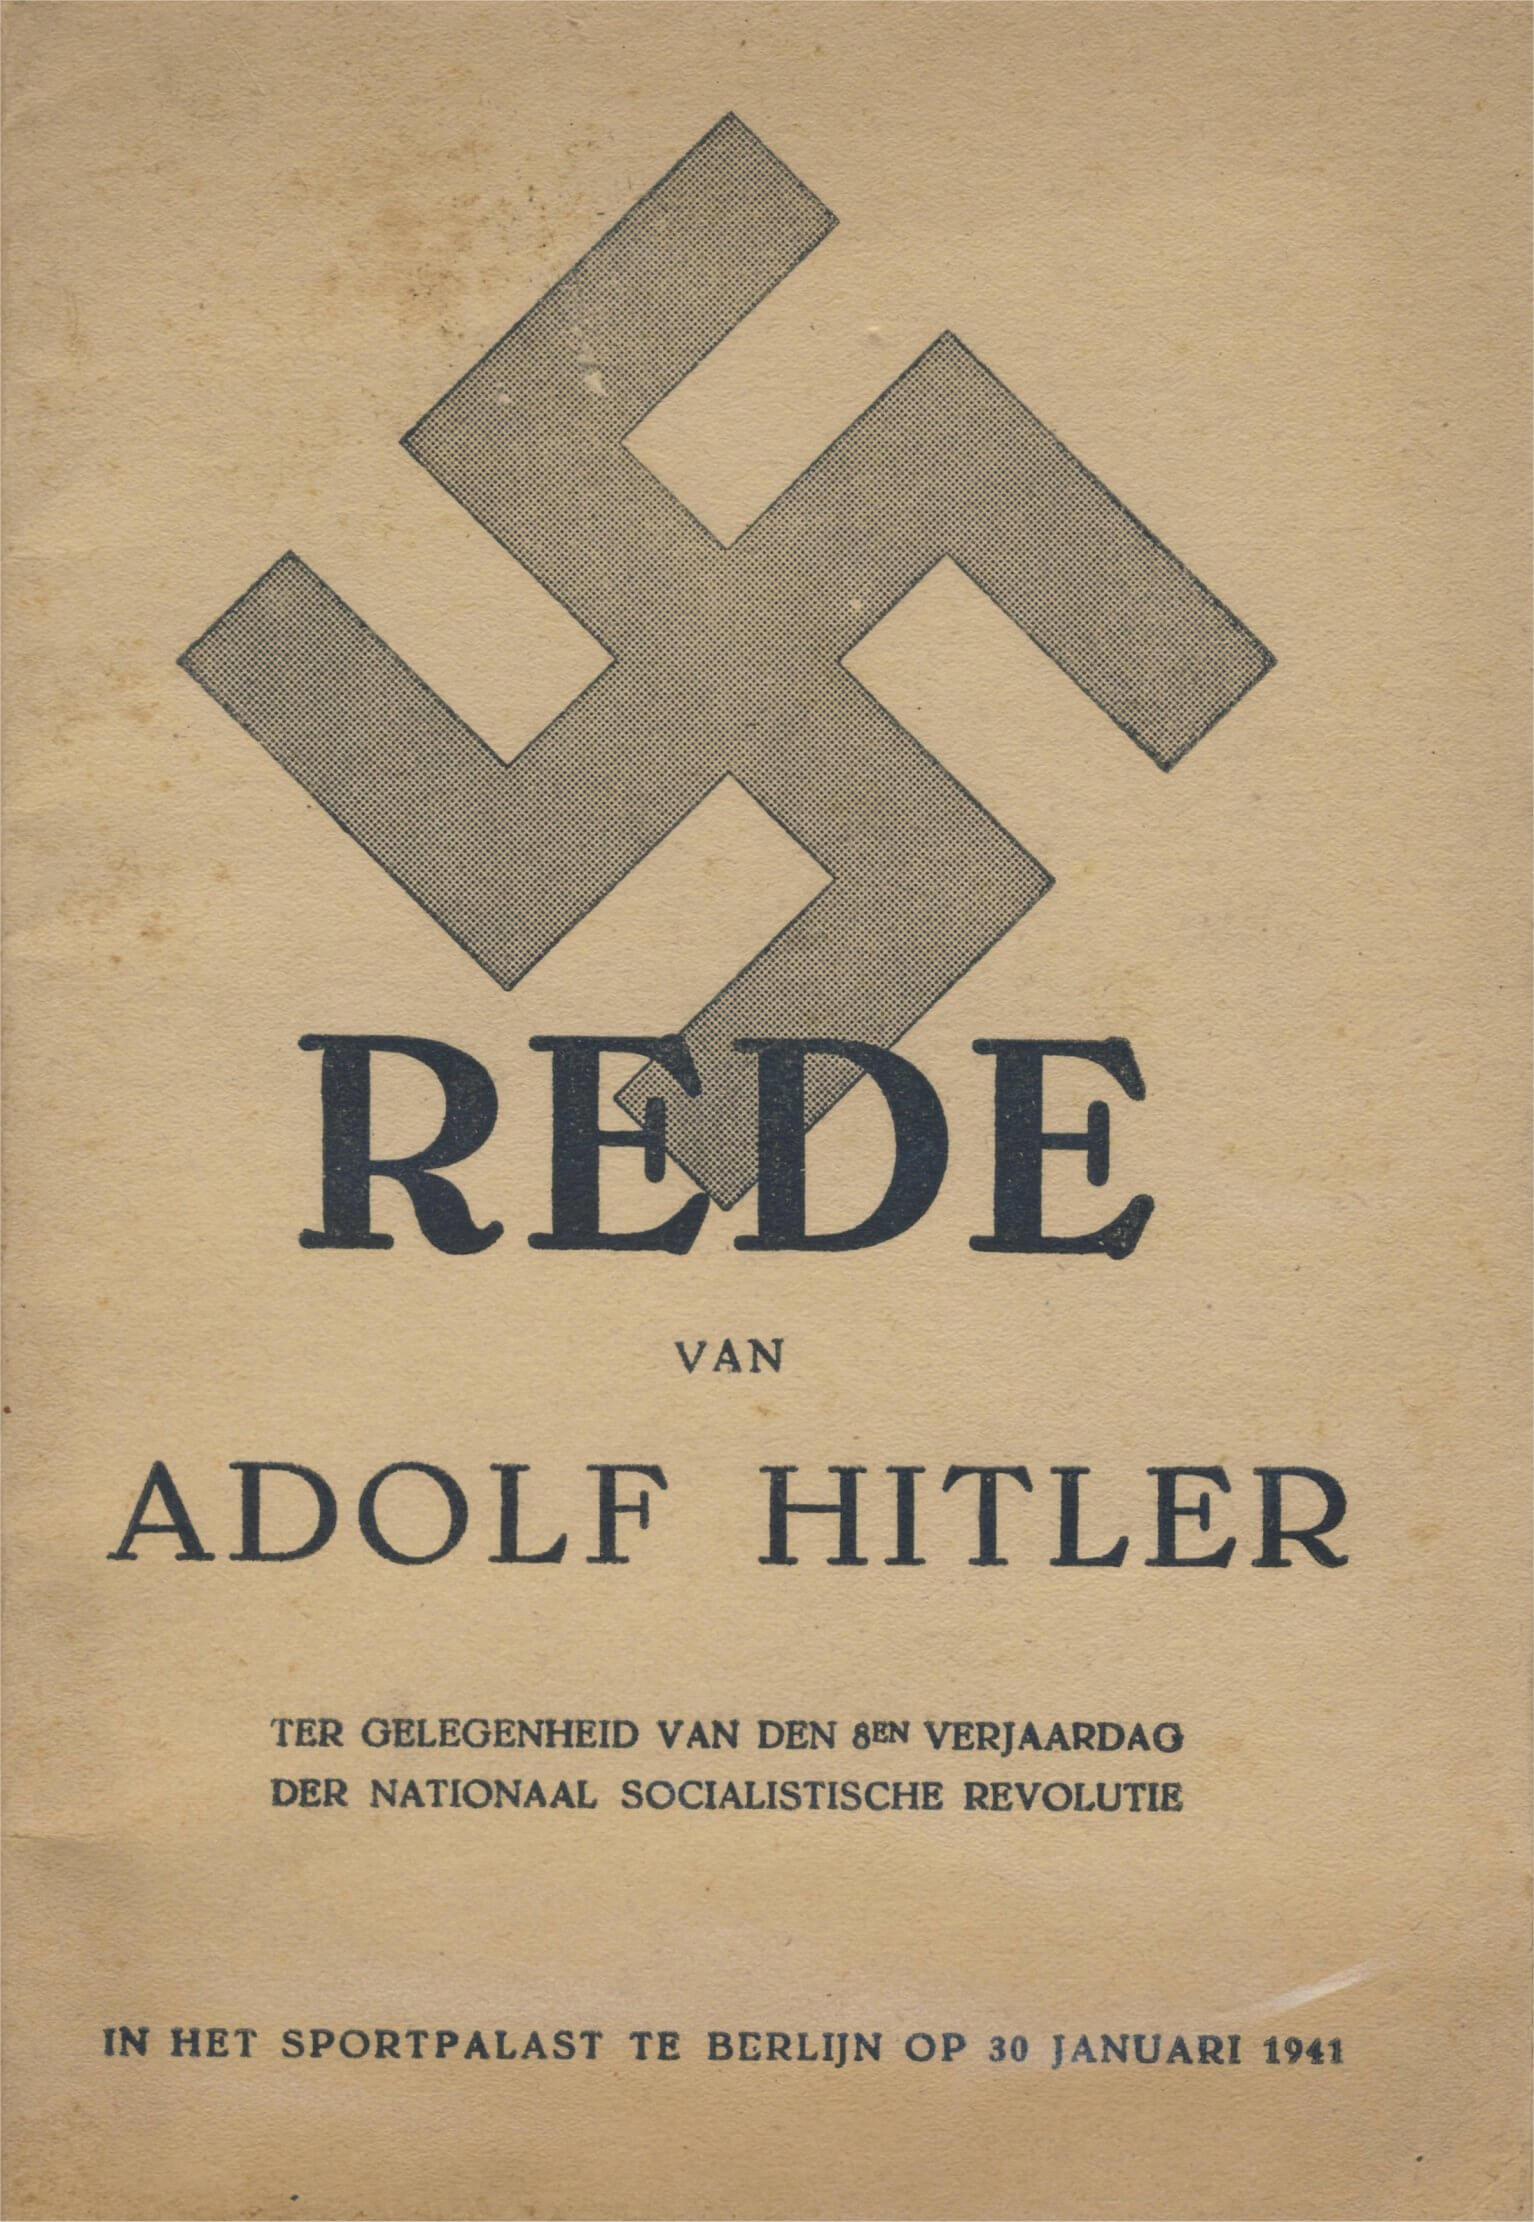 Rede adolf hiltler sportpalast 30 januari 1941 hakenkruis